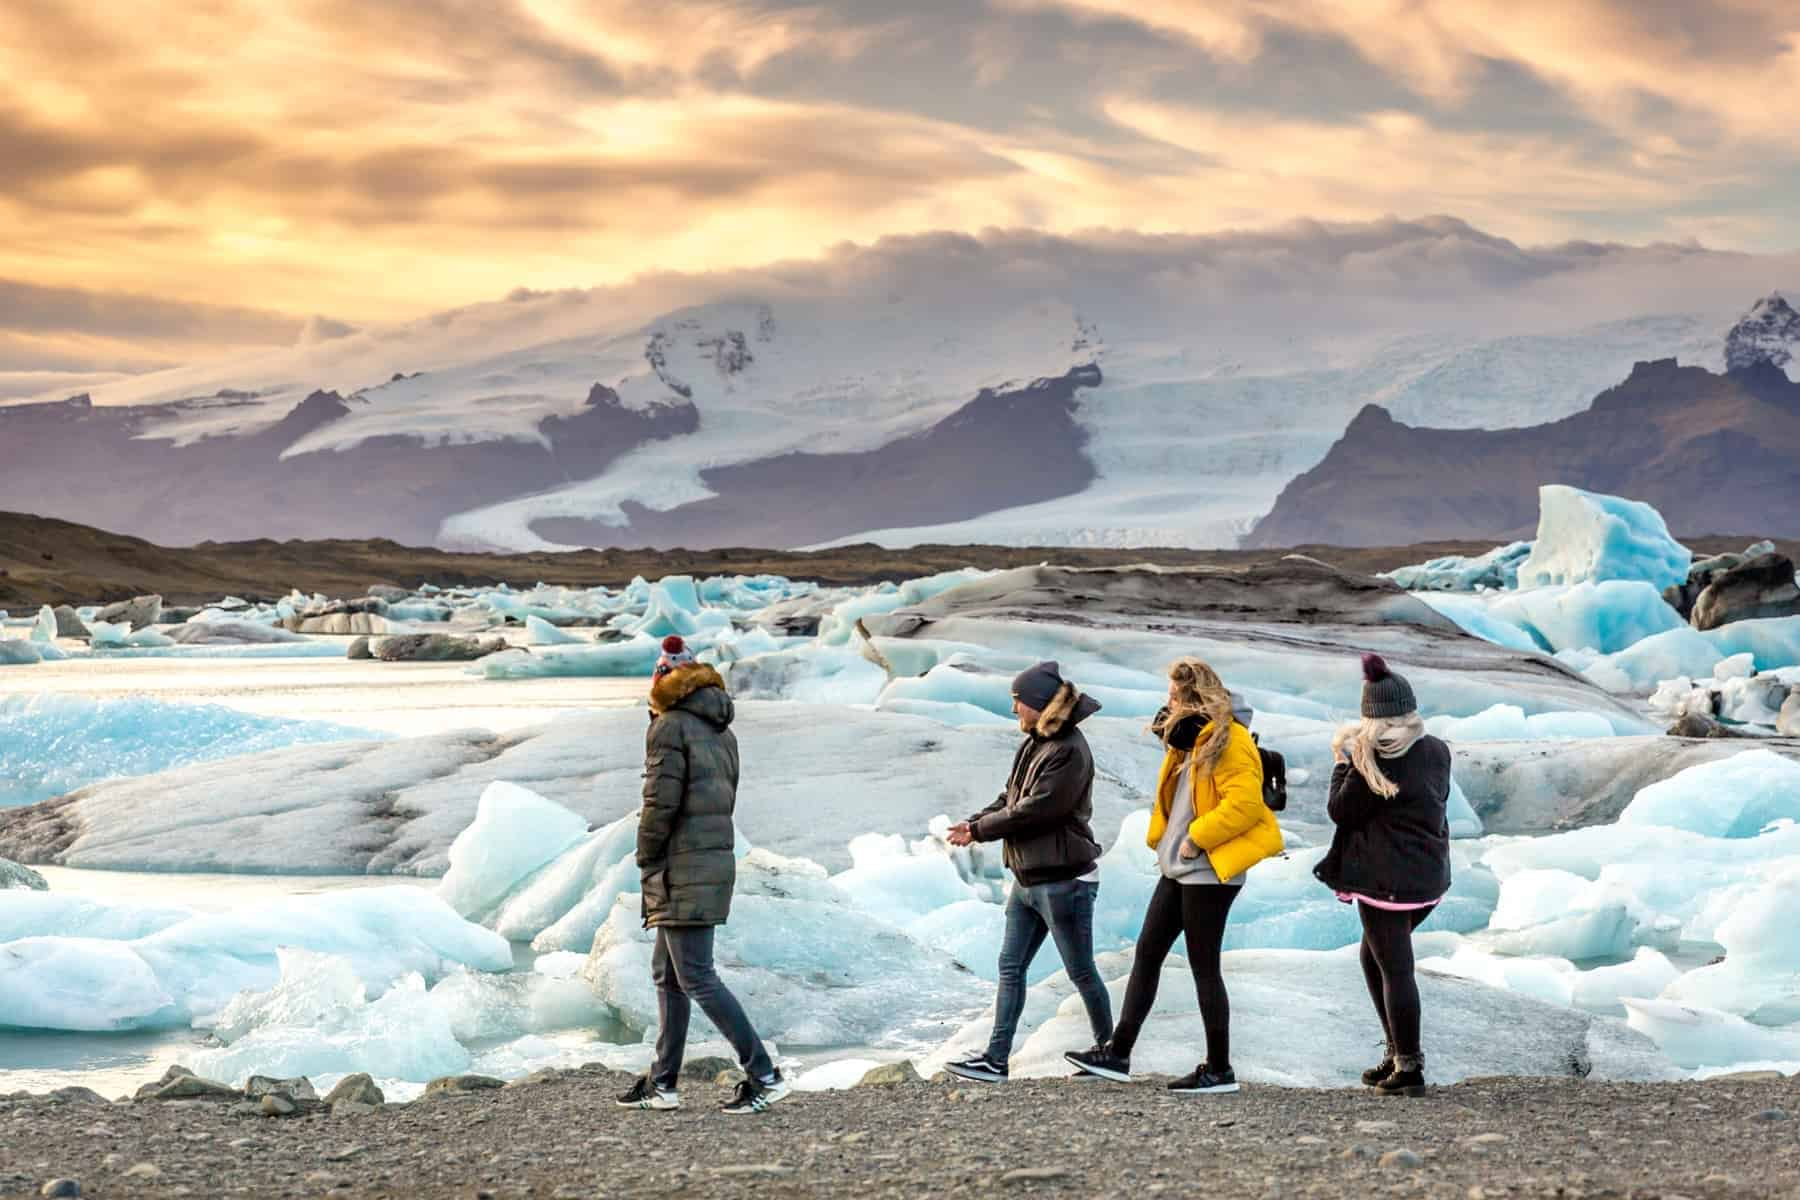 Jökulsárlón, Iceland. Tourists and locals enjoying the Jökulsárlón iceberg lagoon with glacier in the background in Iceland